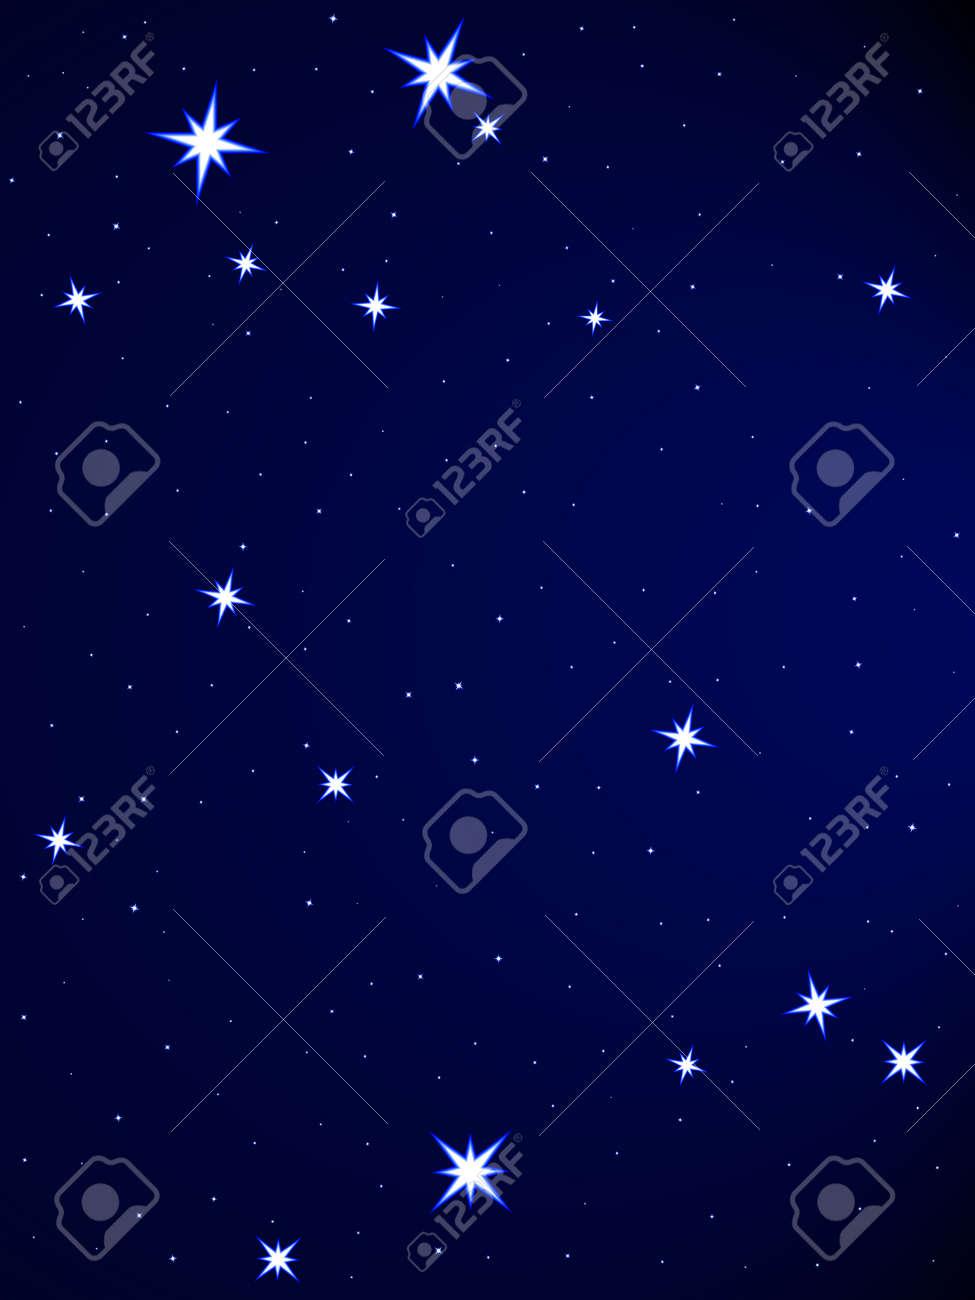 Gemini constellation on the starry sky Stock Vector - 25202029